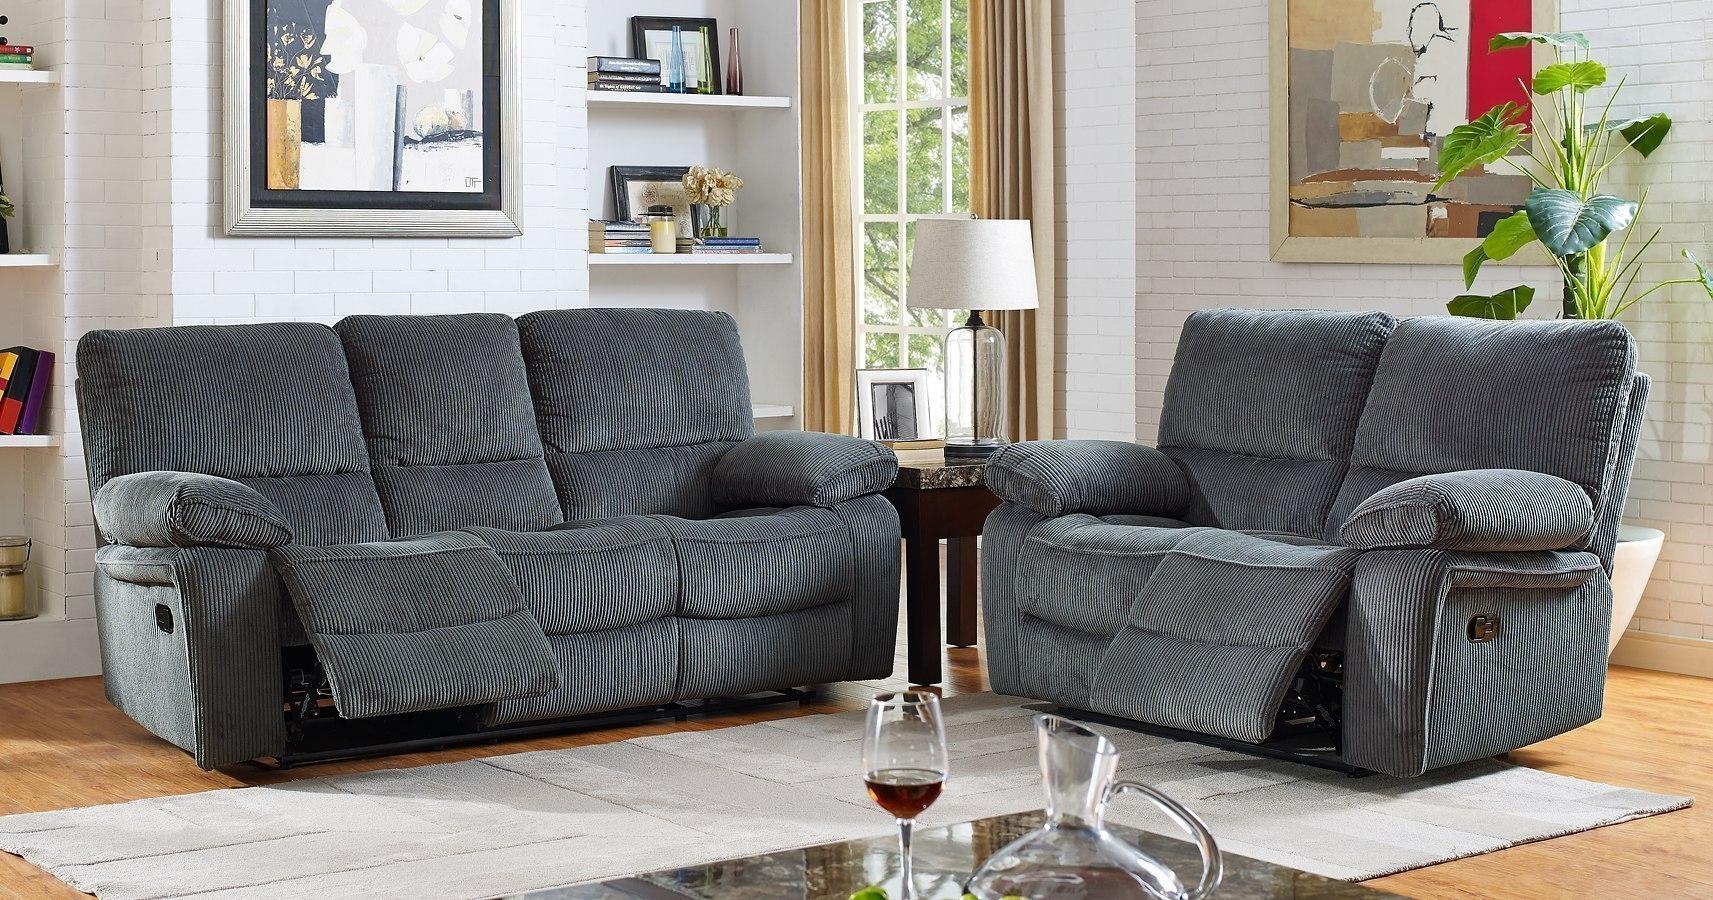 Walker Power Reclining Living Room Set Storm Grey